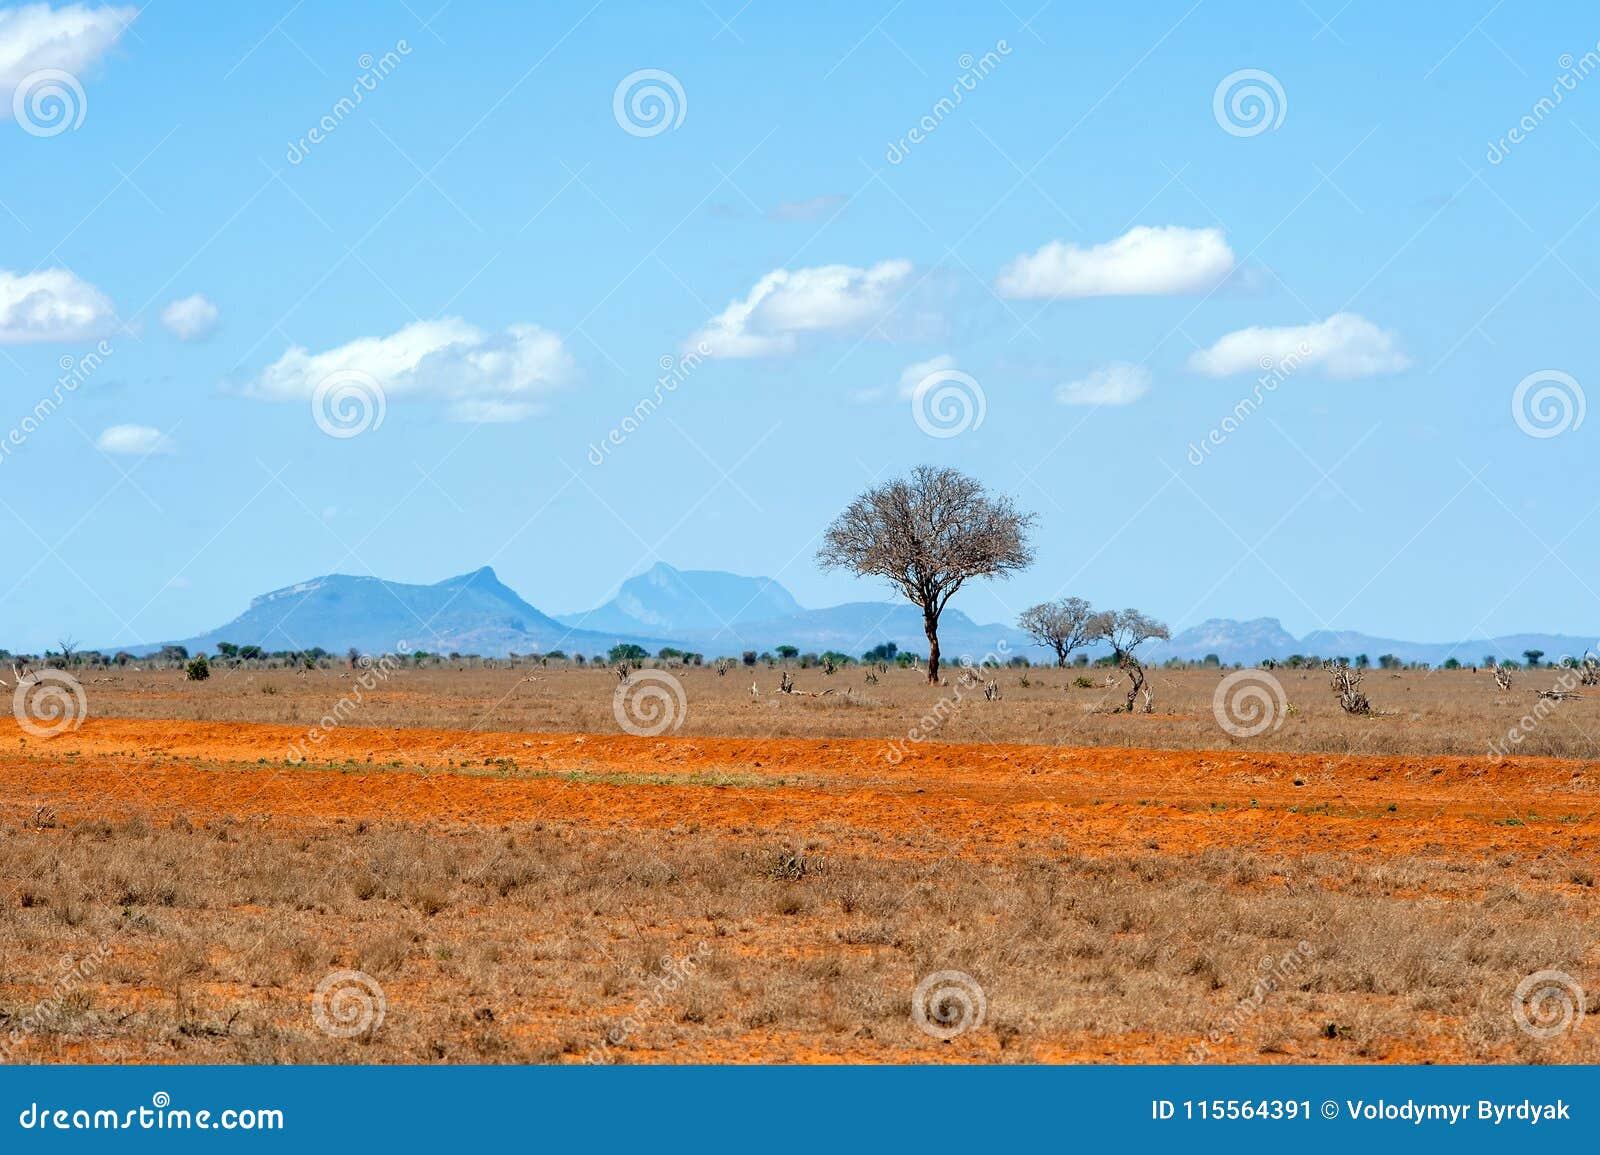 Ландшафт с никто дерево в Африке